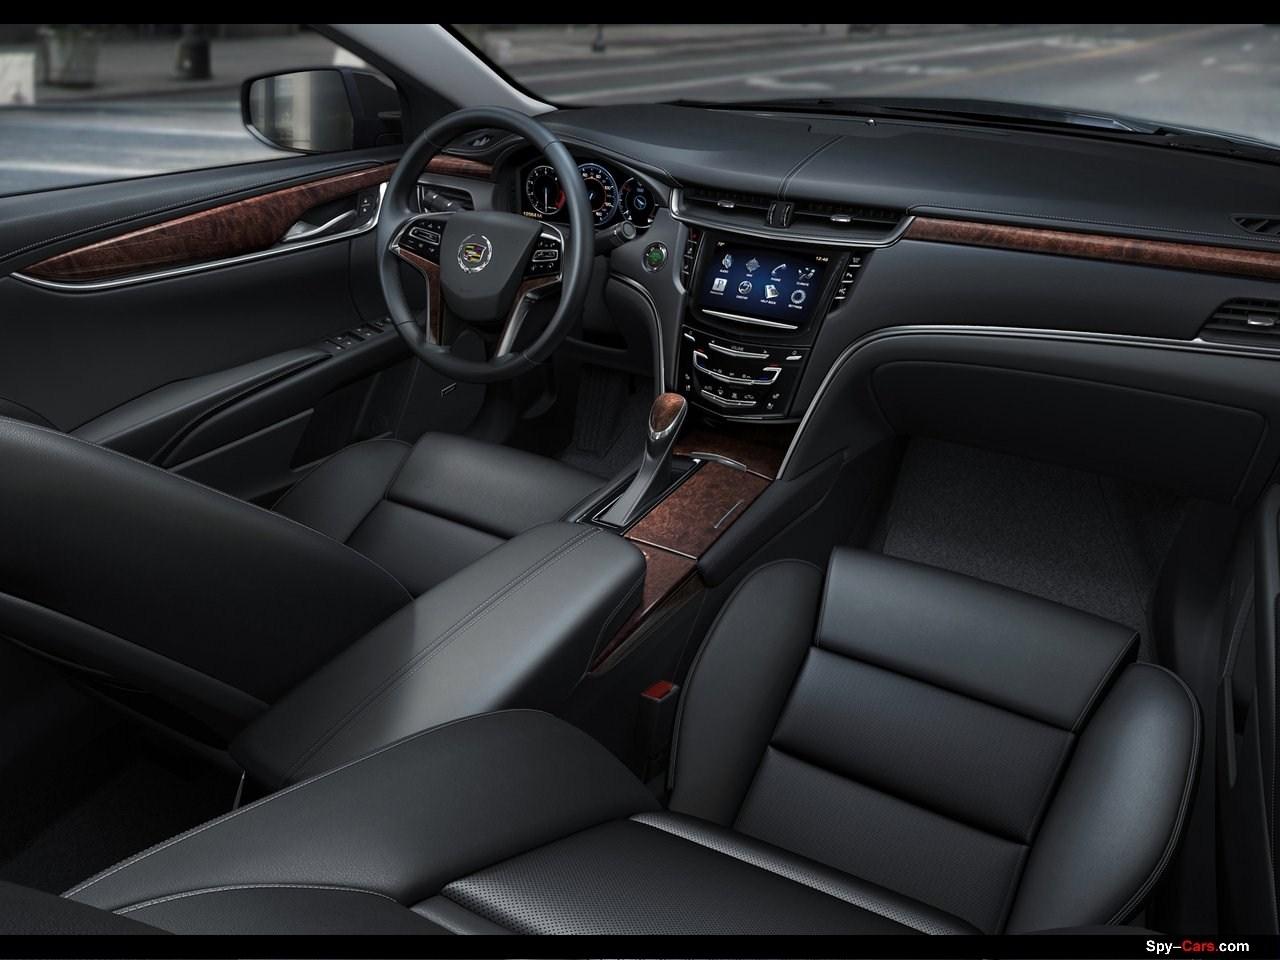 2013 Cadillac XTS | Cadillac Autos Spain